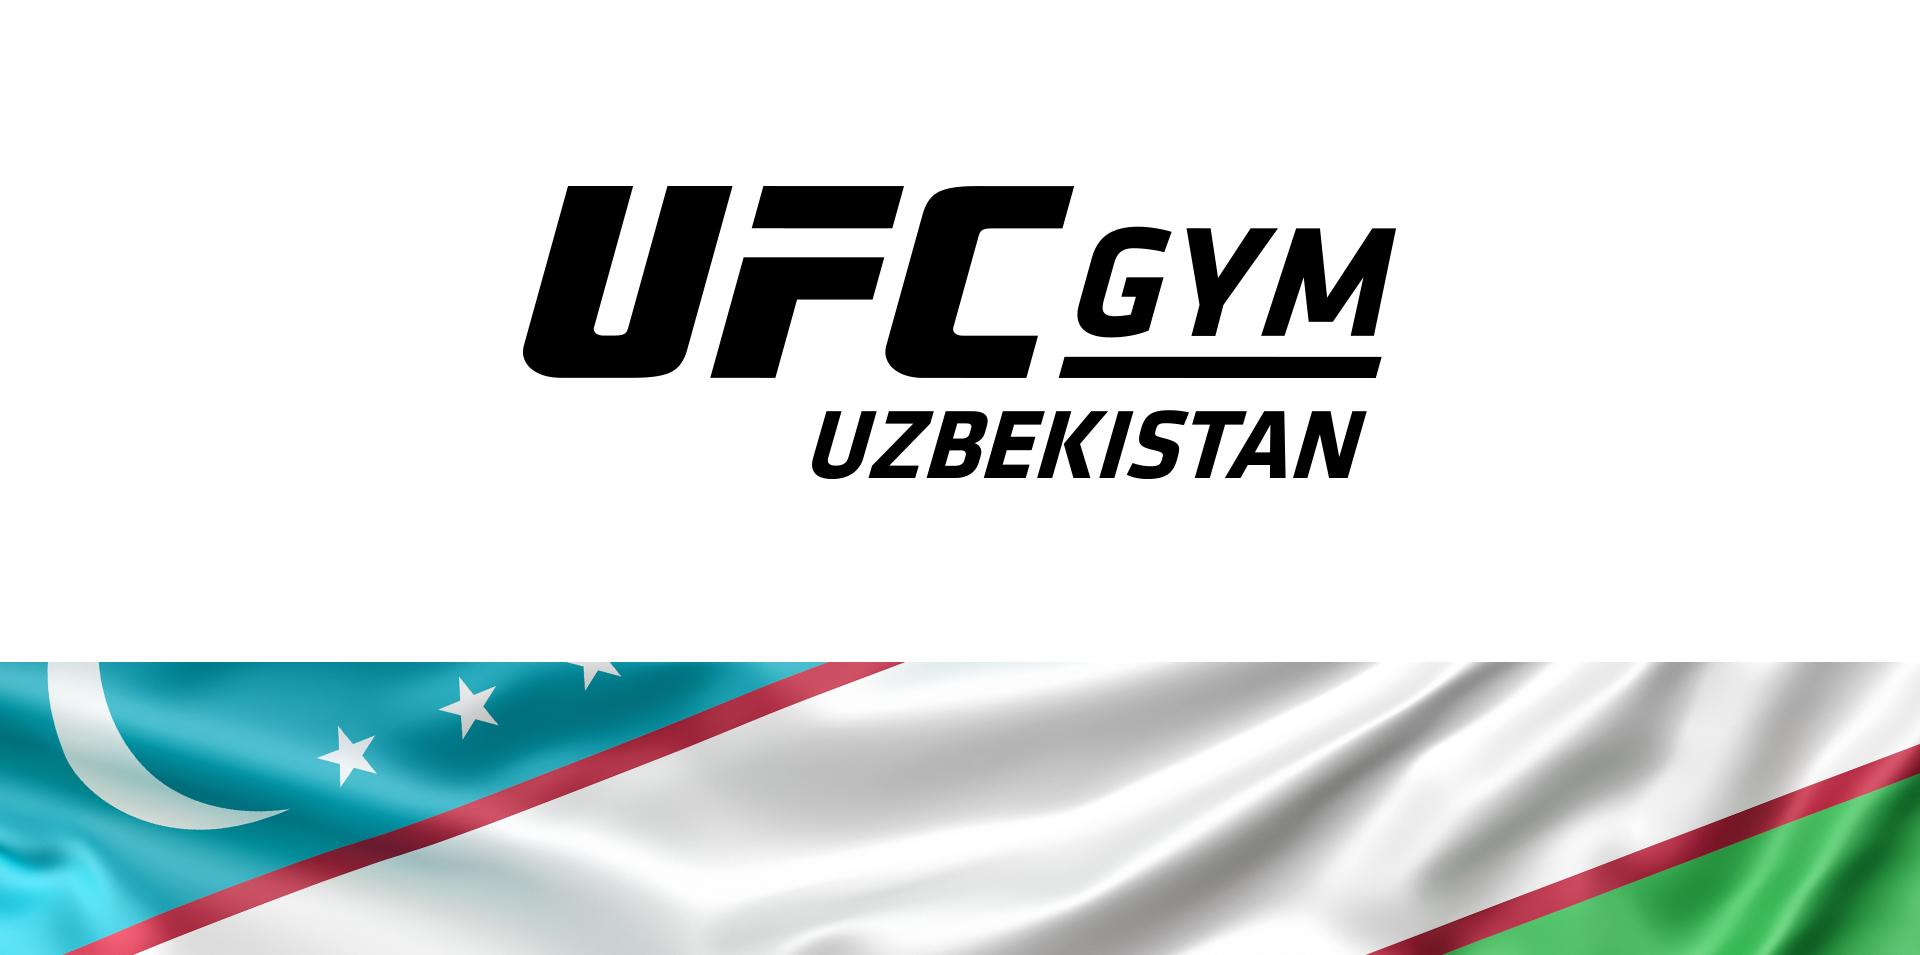 Uzbekistan Featured Image